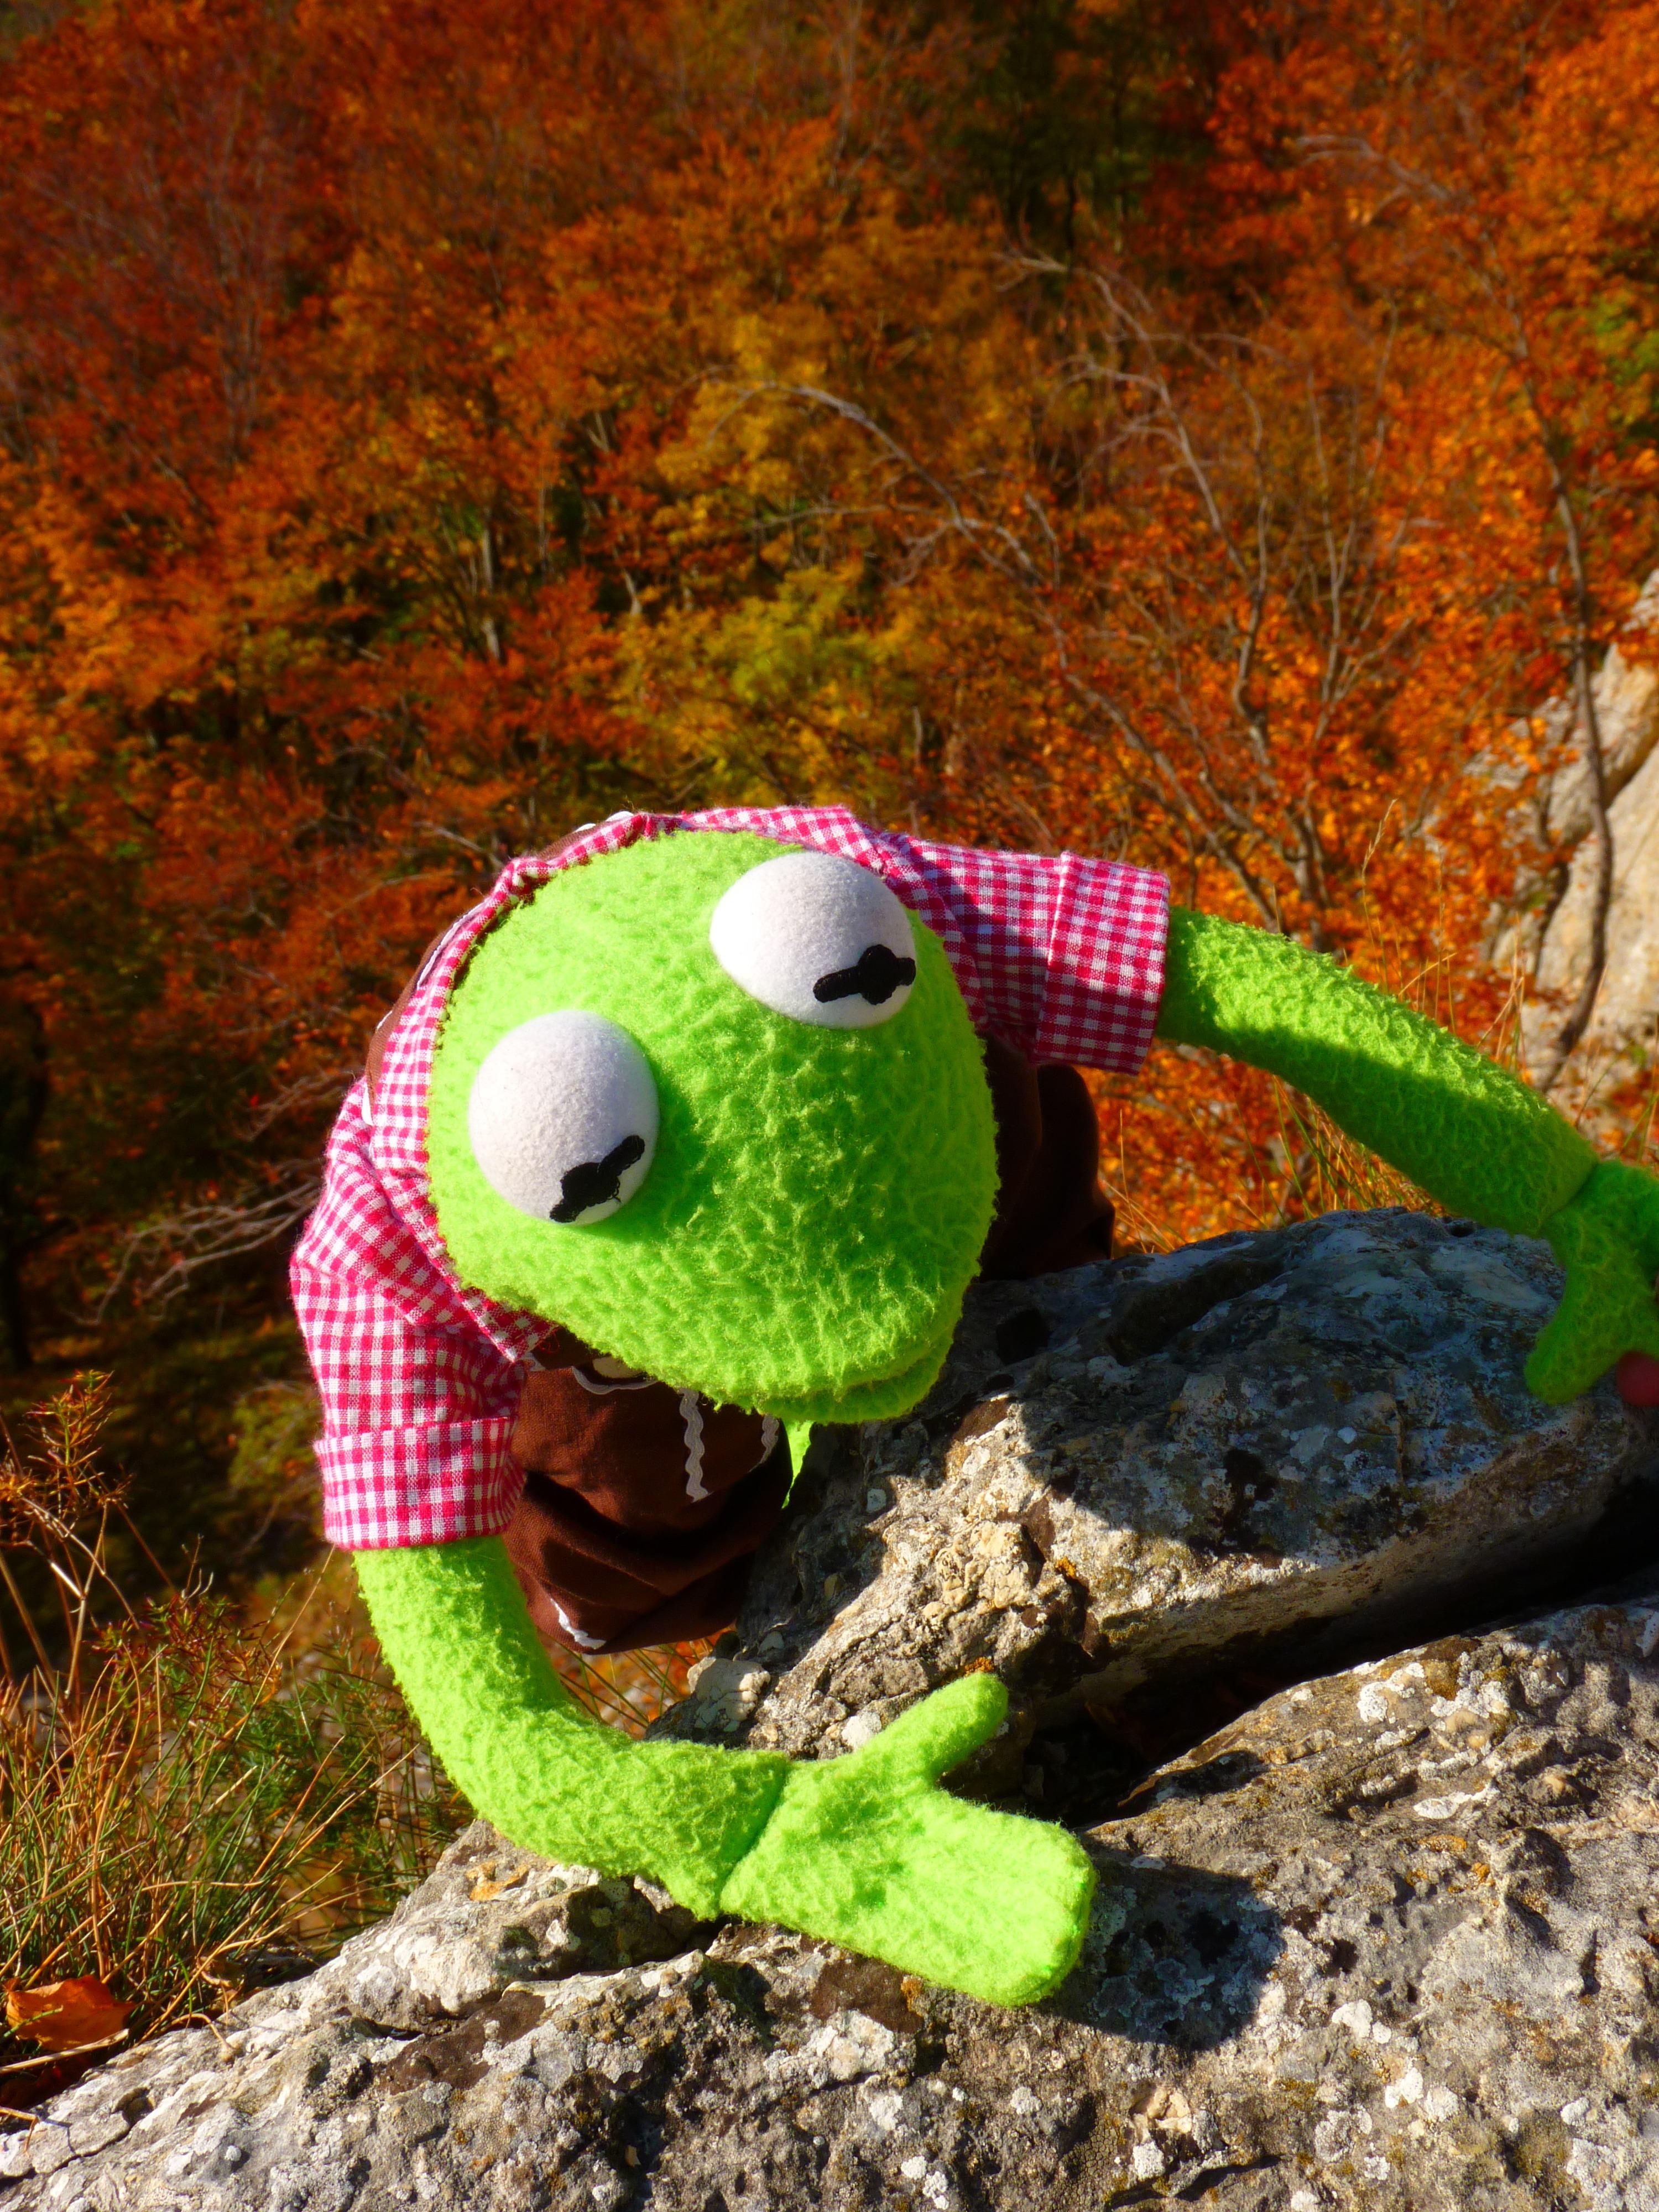 Fotos gratis : césped, rock, hoja, fauna silvestre, verde, otoño ...